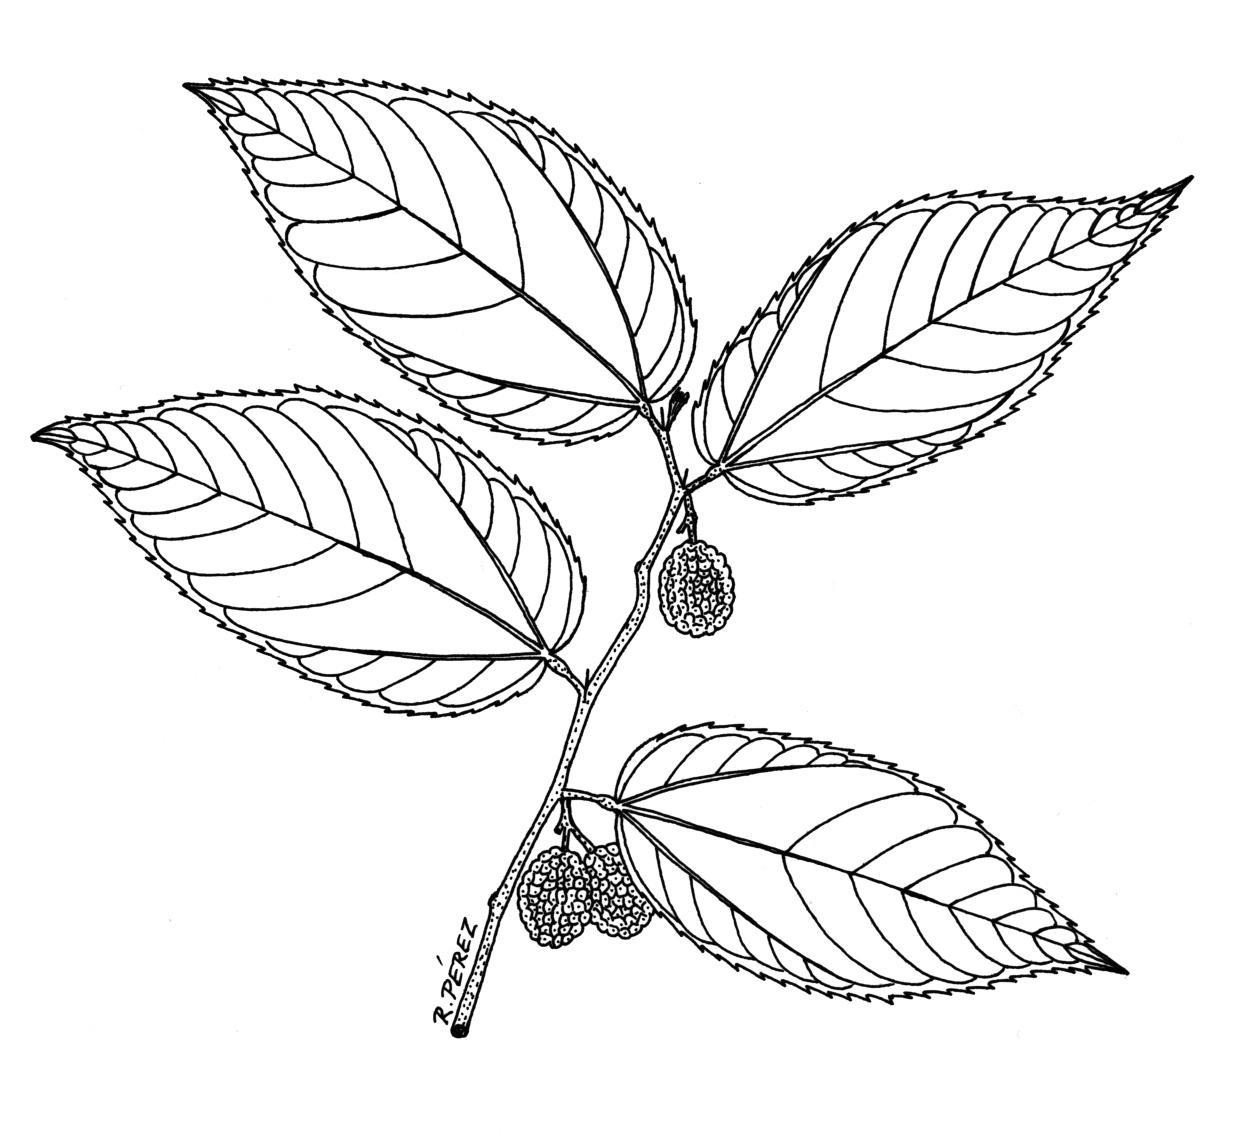 Drawn leaves flower leaves Tree Drawing: R atlas Panama